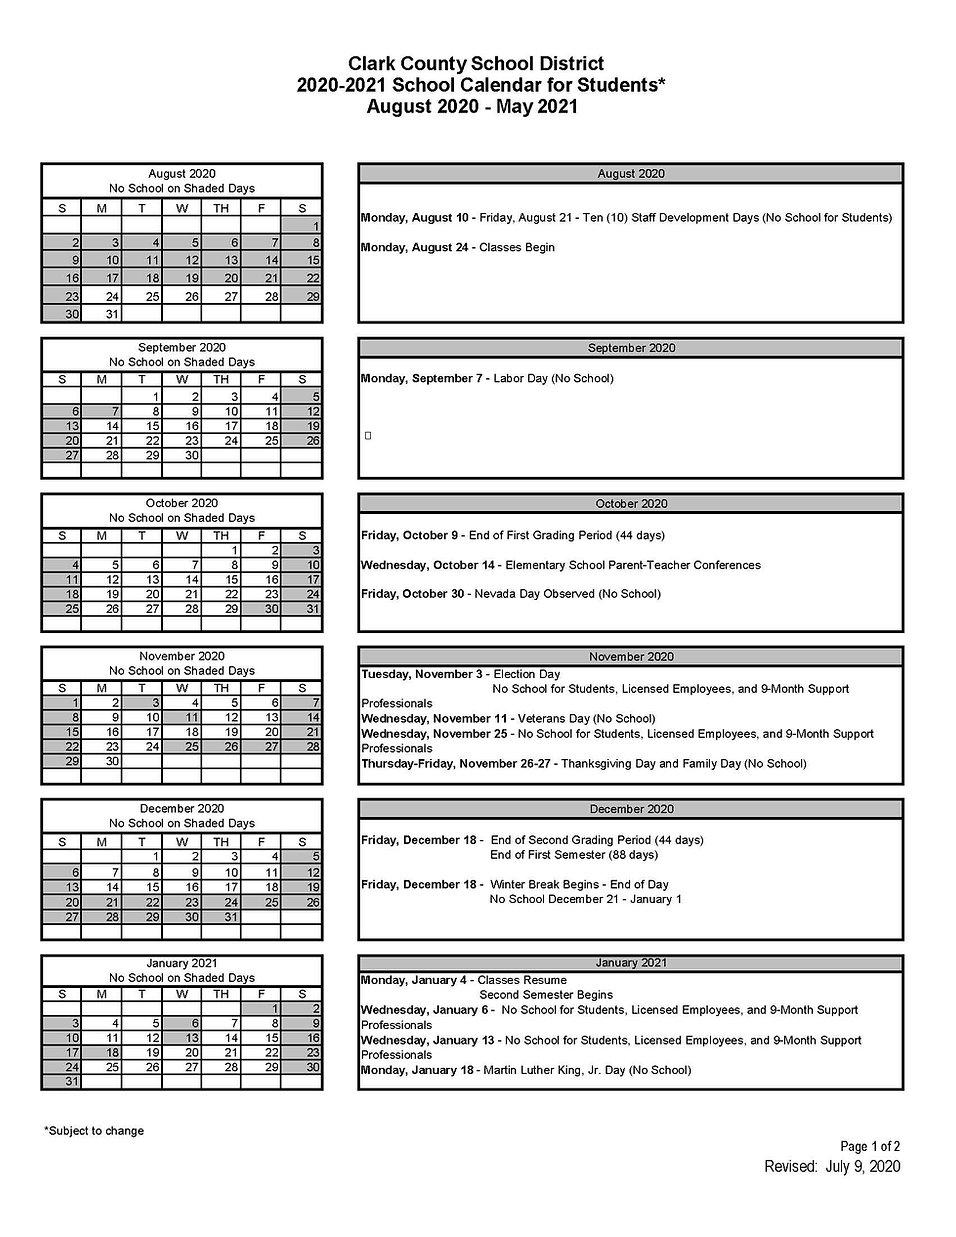 2020-2021-school-calendar-students (3)_P